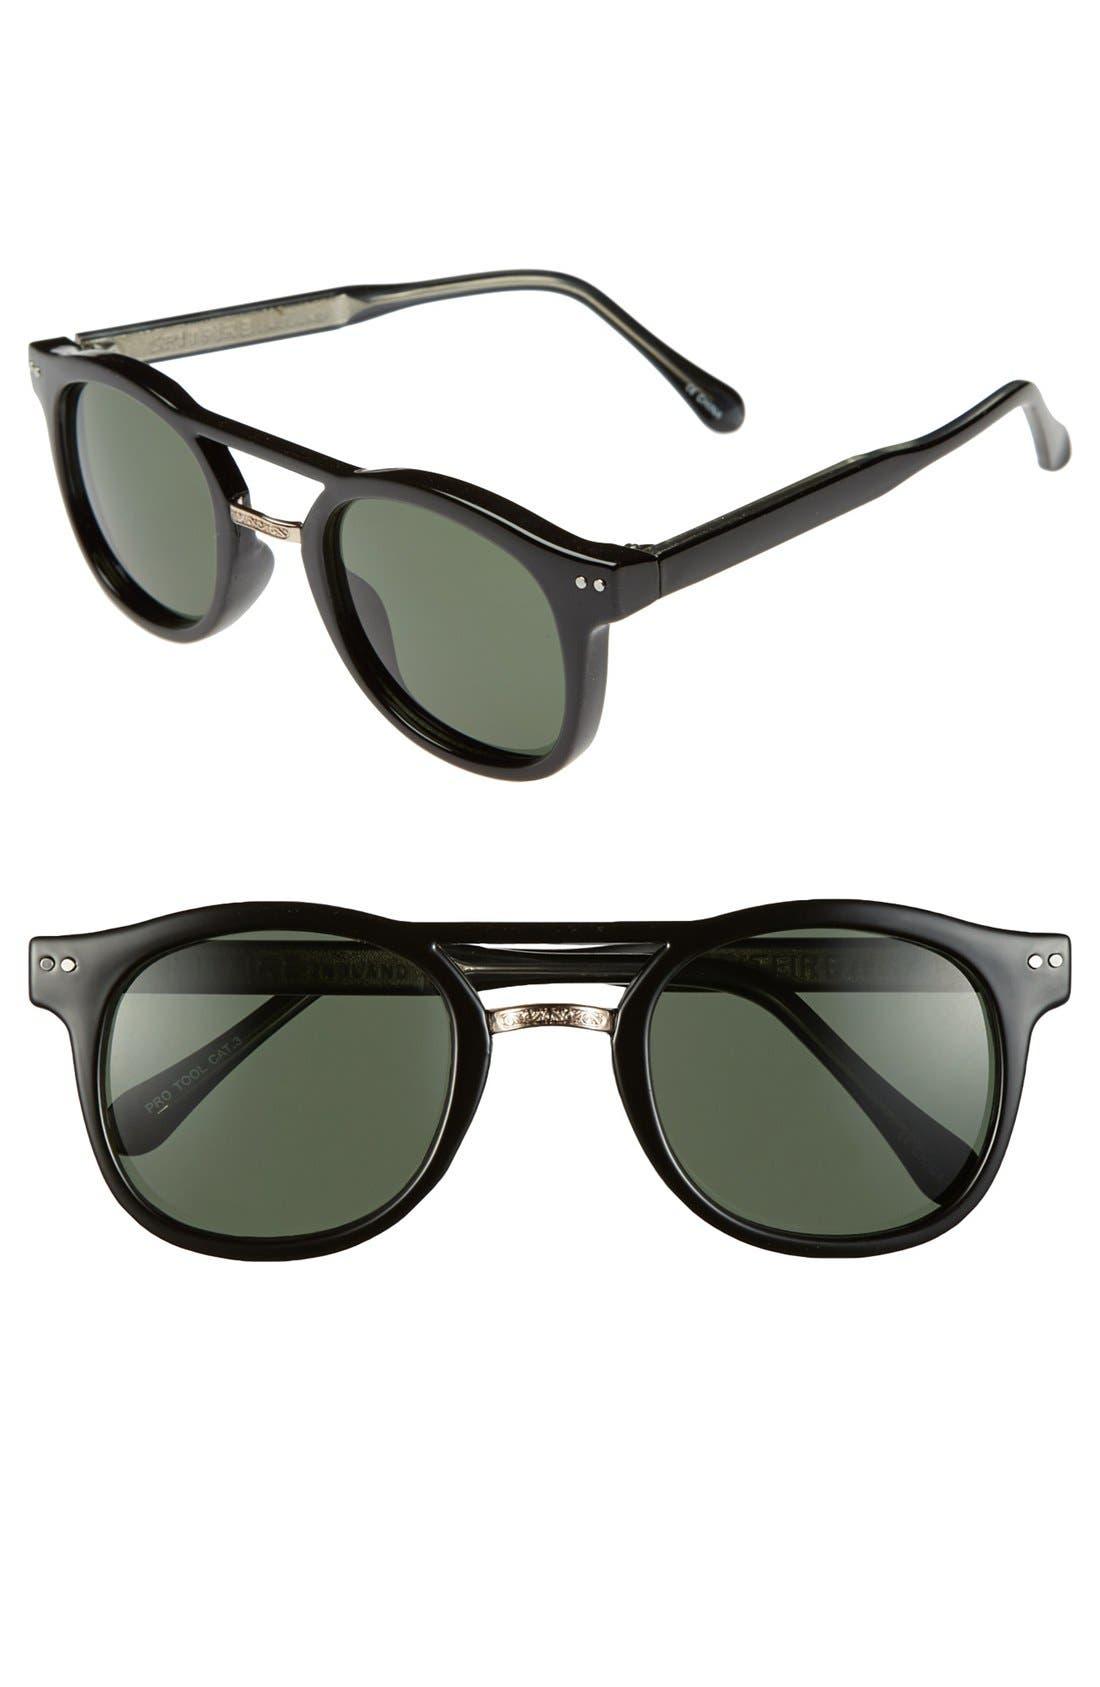 Main Image - Spitfire 'Protool' 50mm Retro Sunglasses